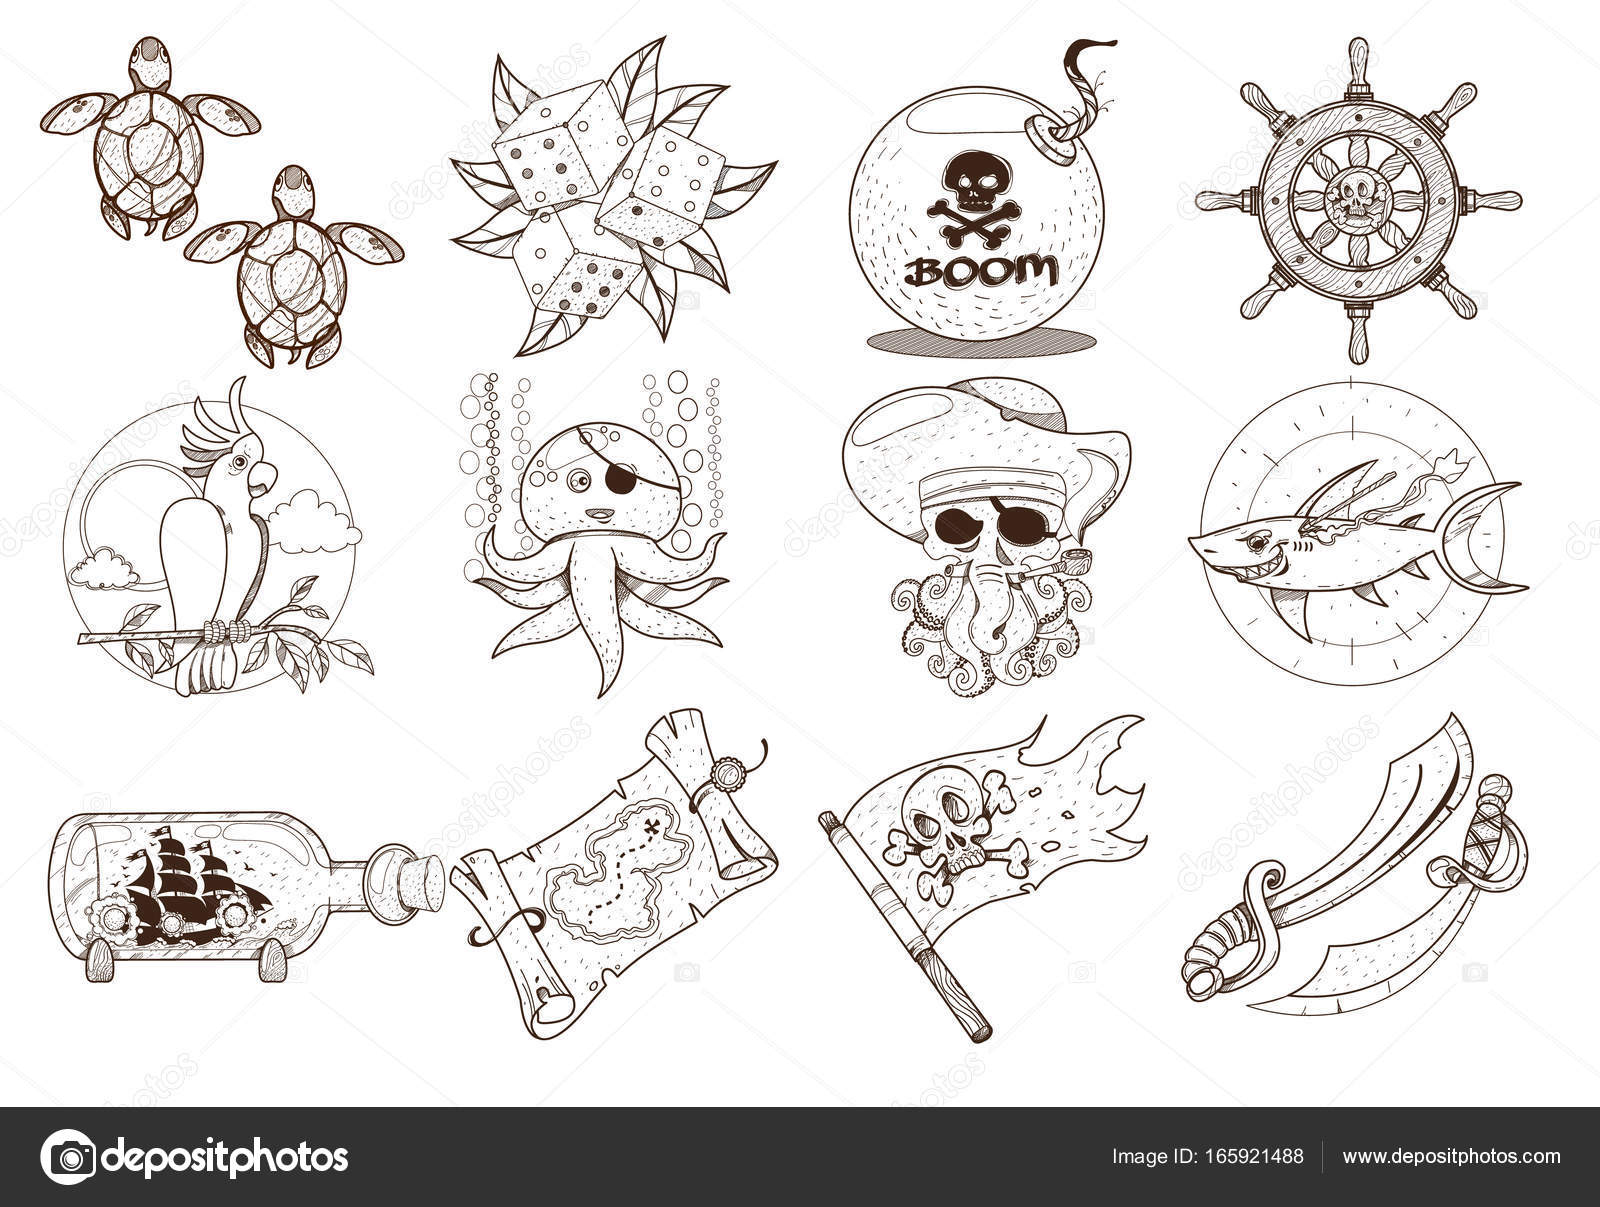 Malvorlagen zum Thema Piraten — Stockvektor © filkusto #165921488